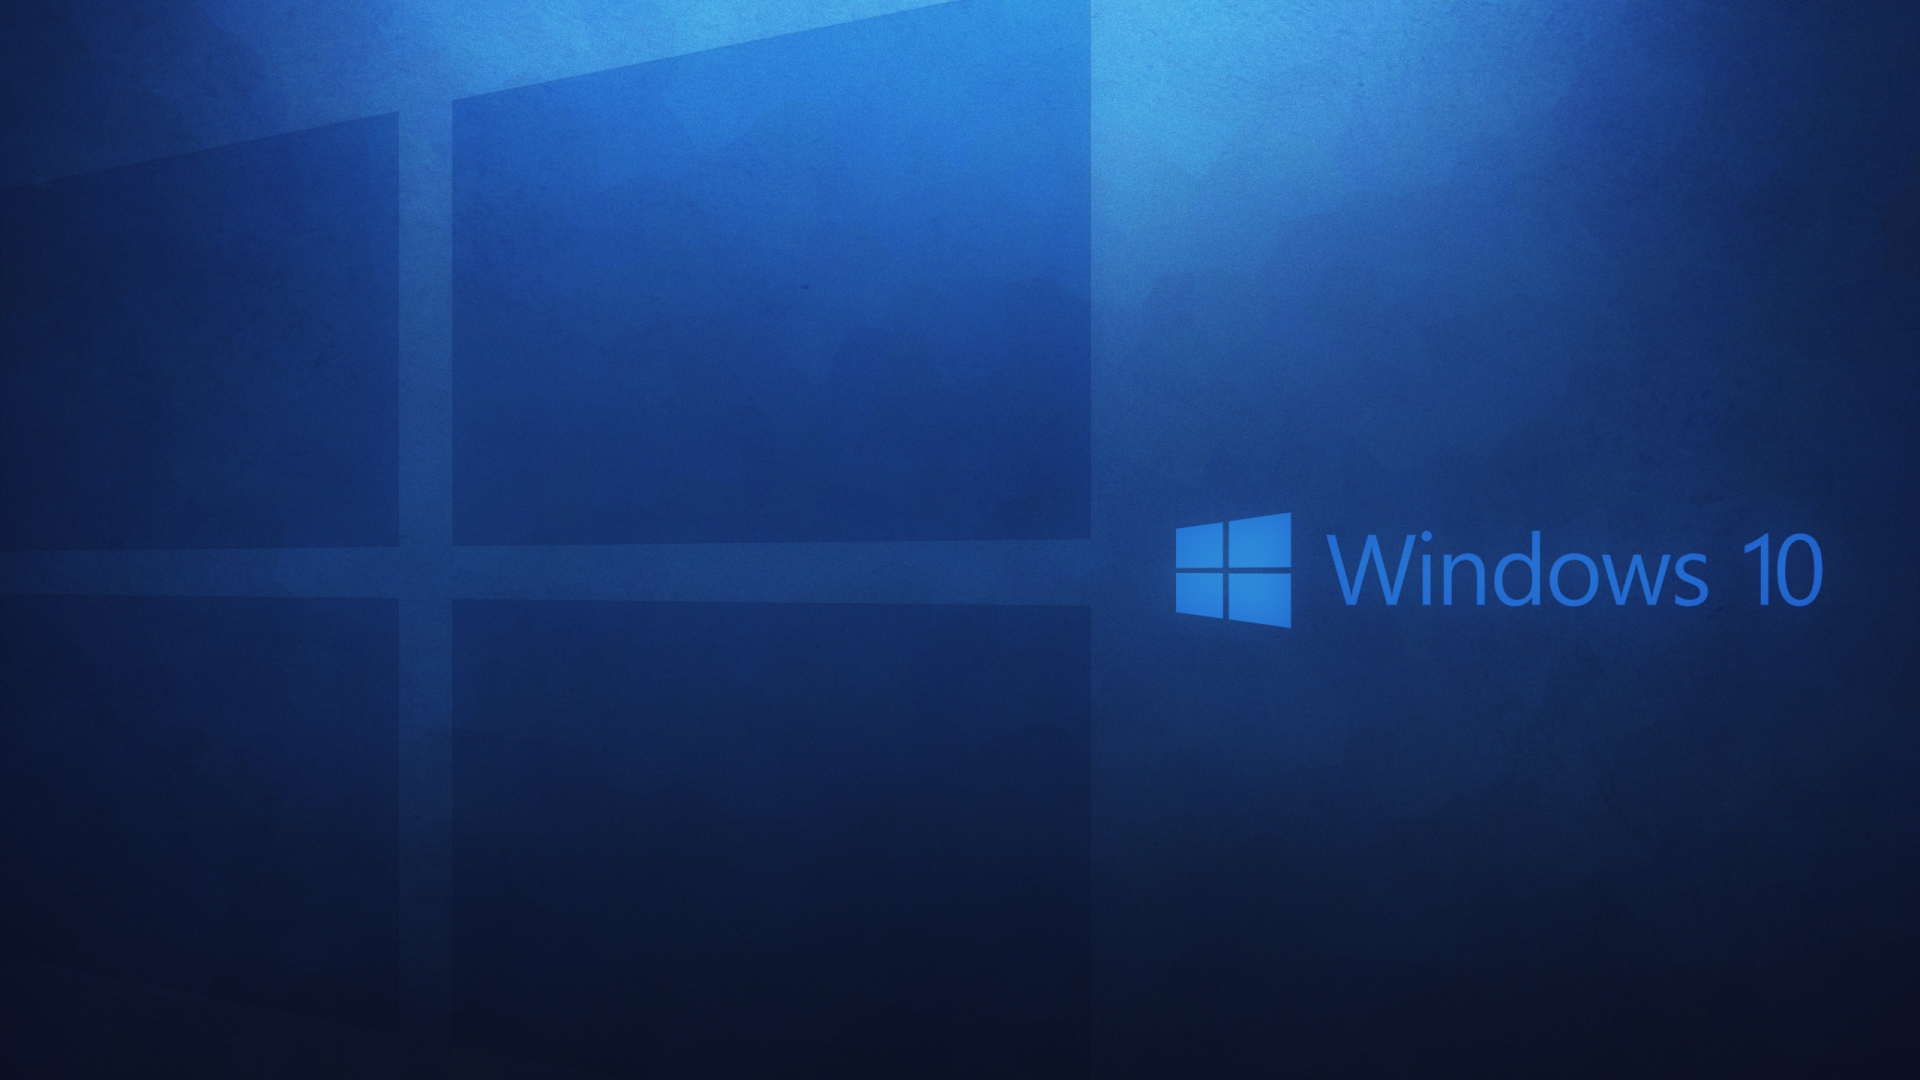 HD Background Windows 10 Wallpaper Microsoft Operating System Blue 1920x1080